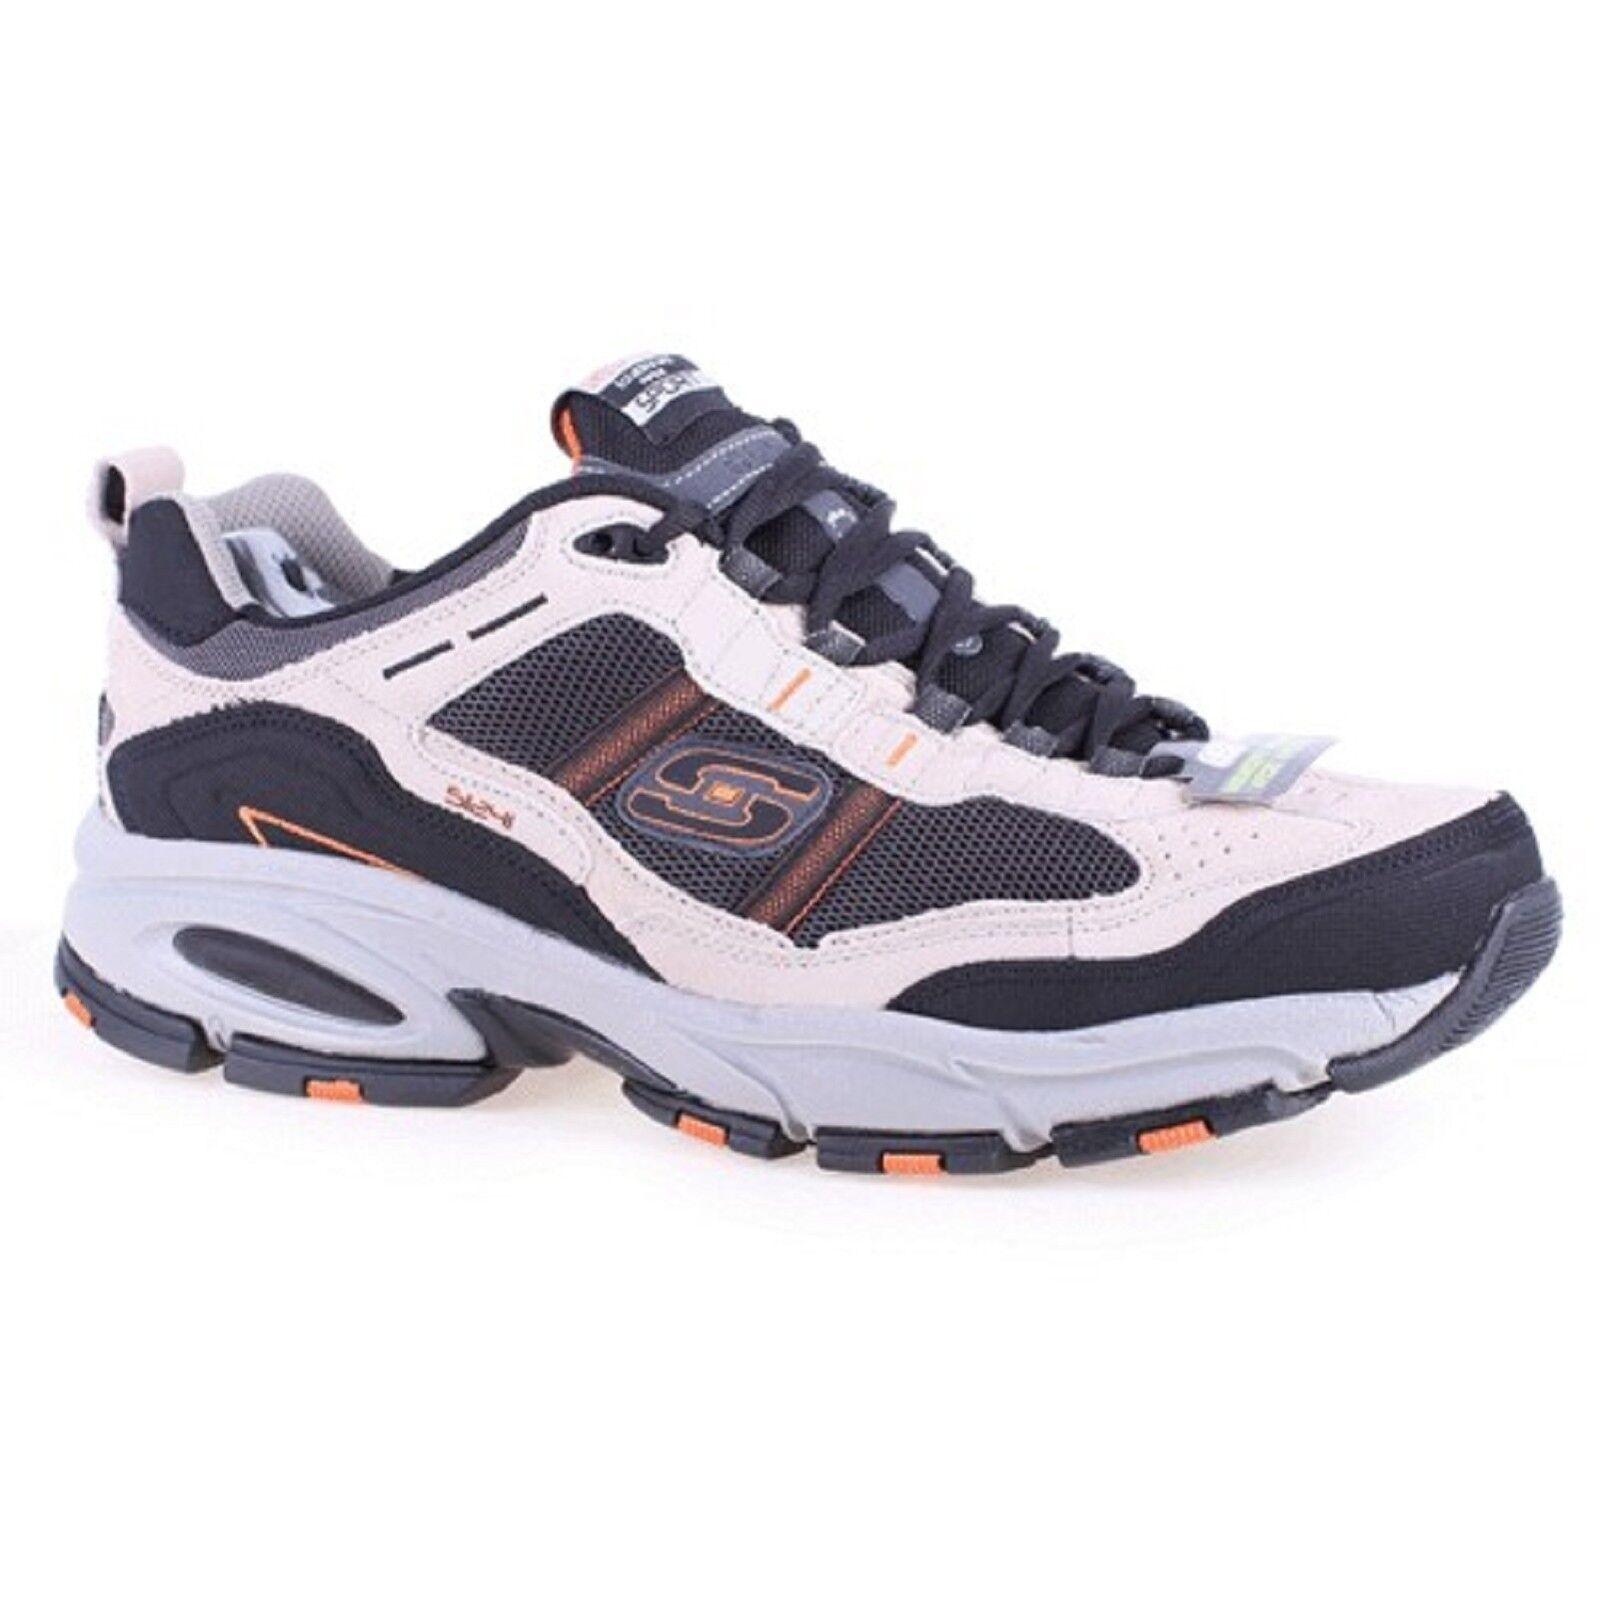 Men Skechers MEMORY-TRAIT 51241TPBK Taupe Memory Foam Lace-Up Sneaker Shoes